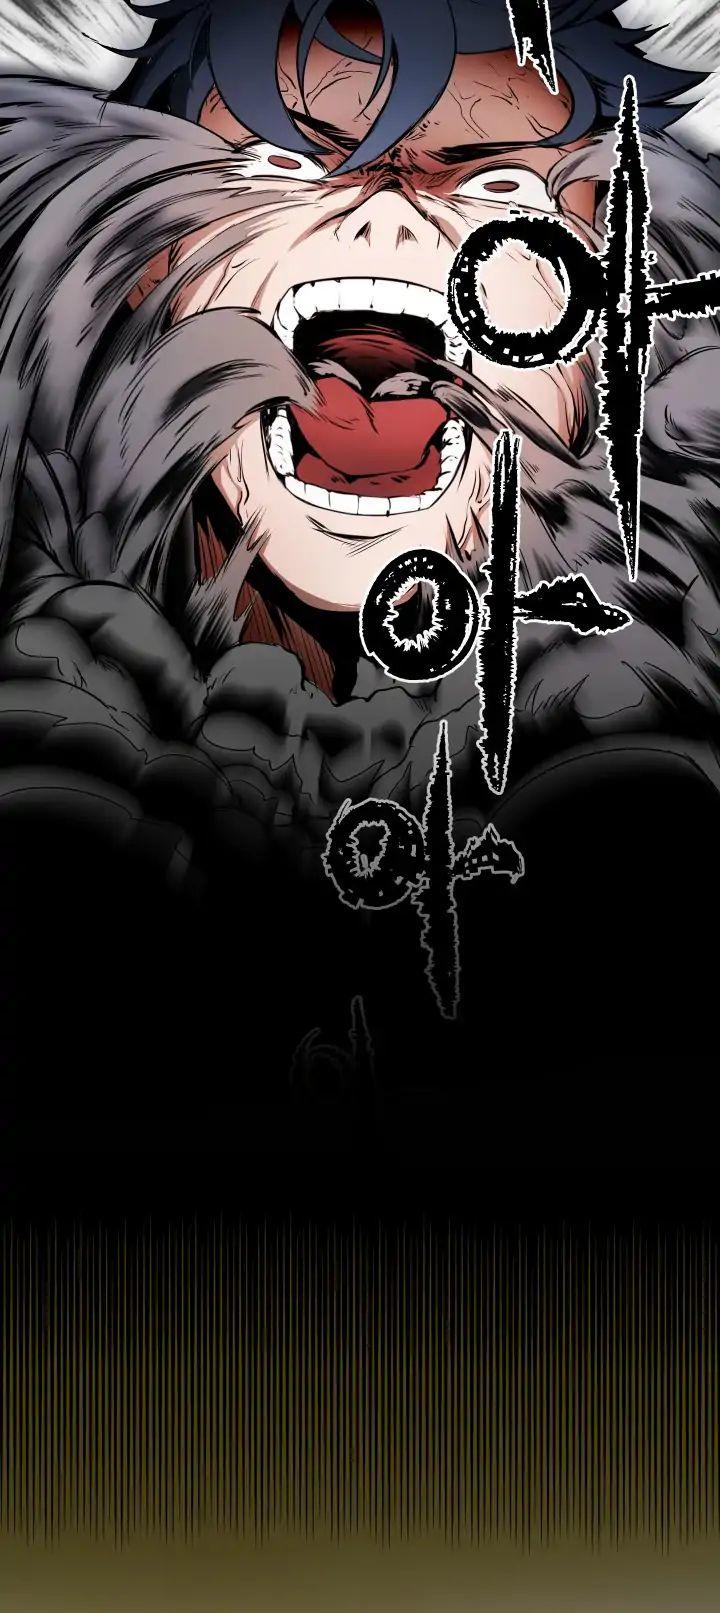 Survival Story Of A Sword King In A Fantasy World Chapter 1 page 30 - Mangakakalots.com